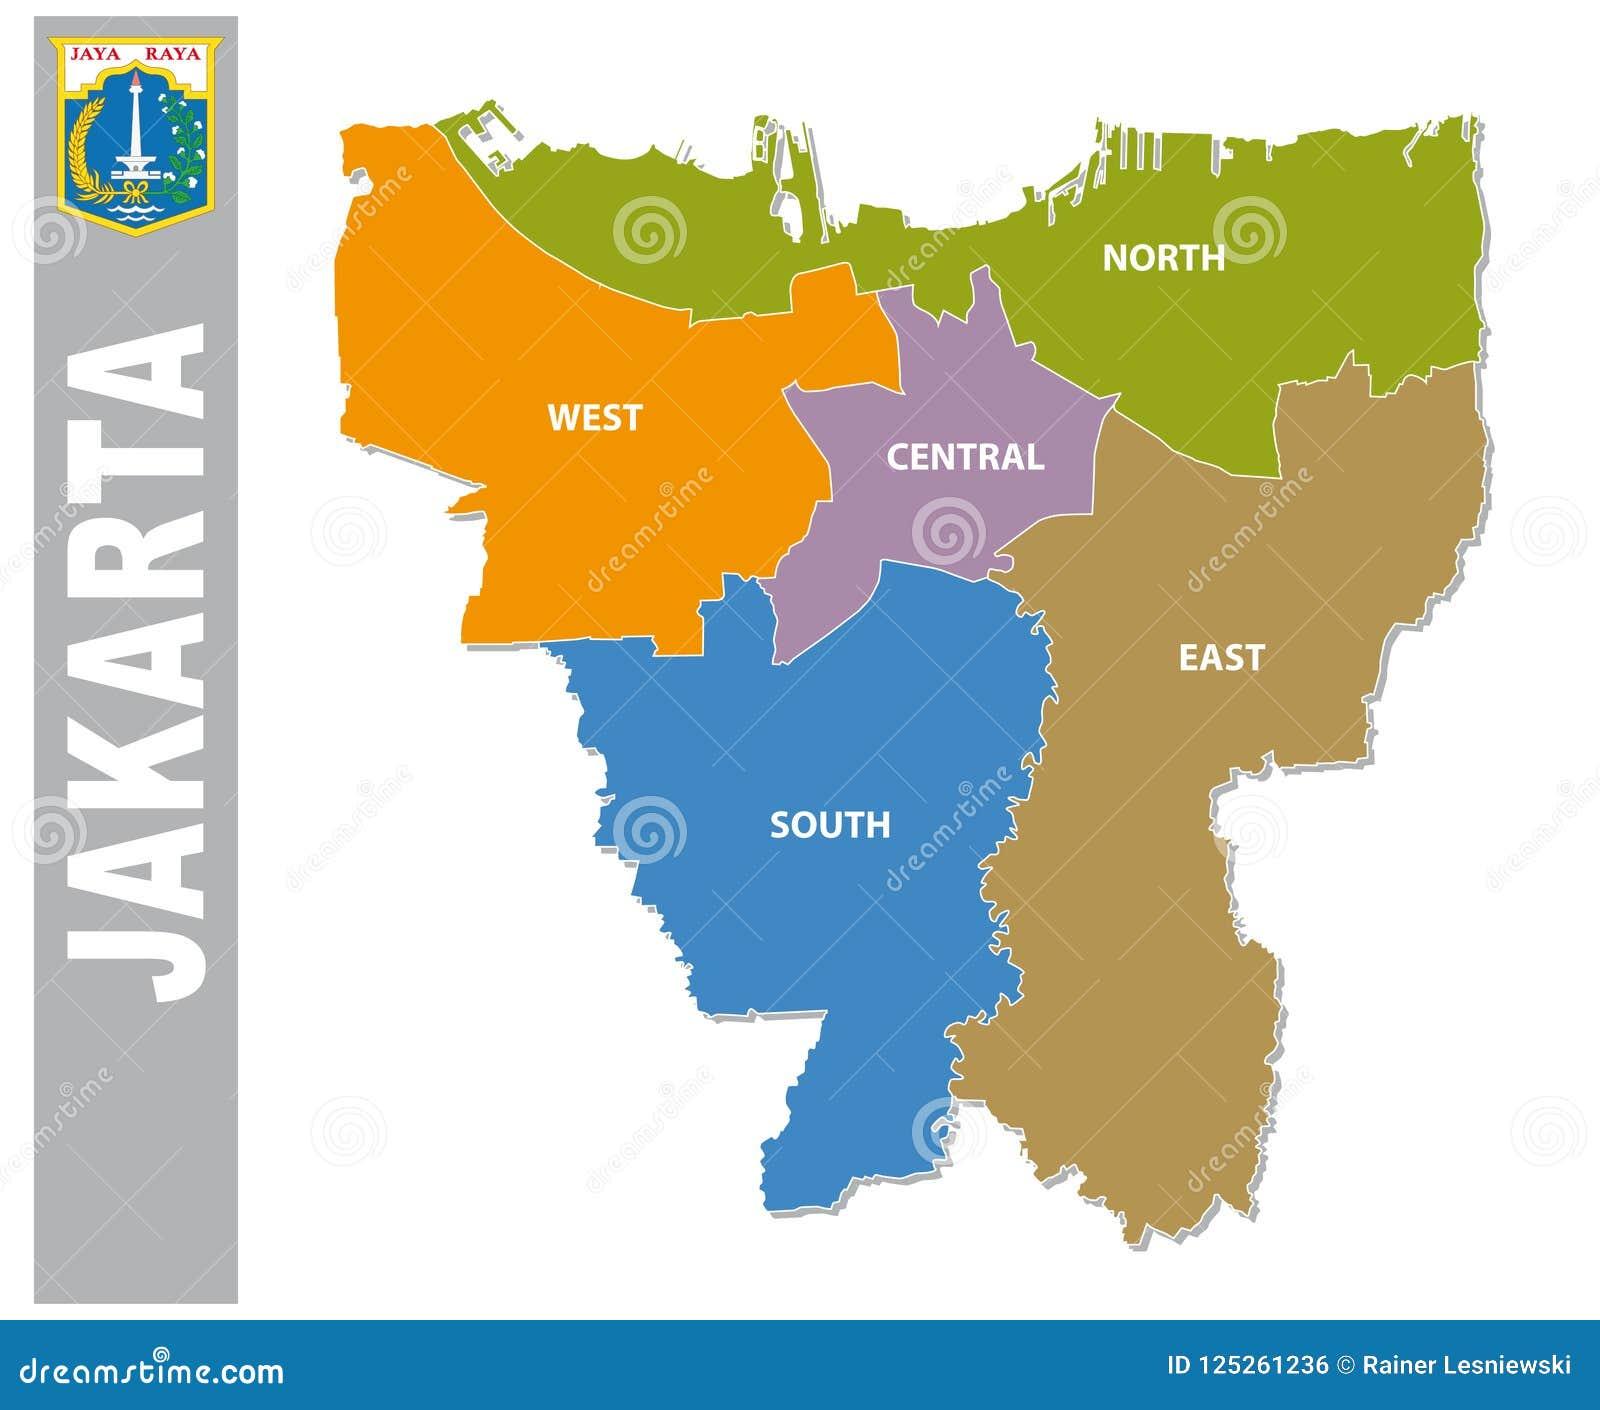 North Jakarta Map on